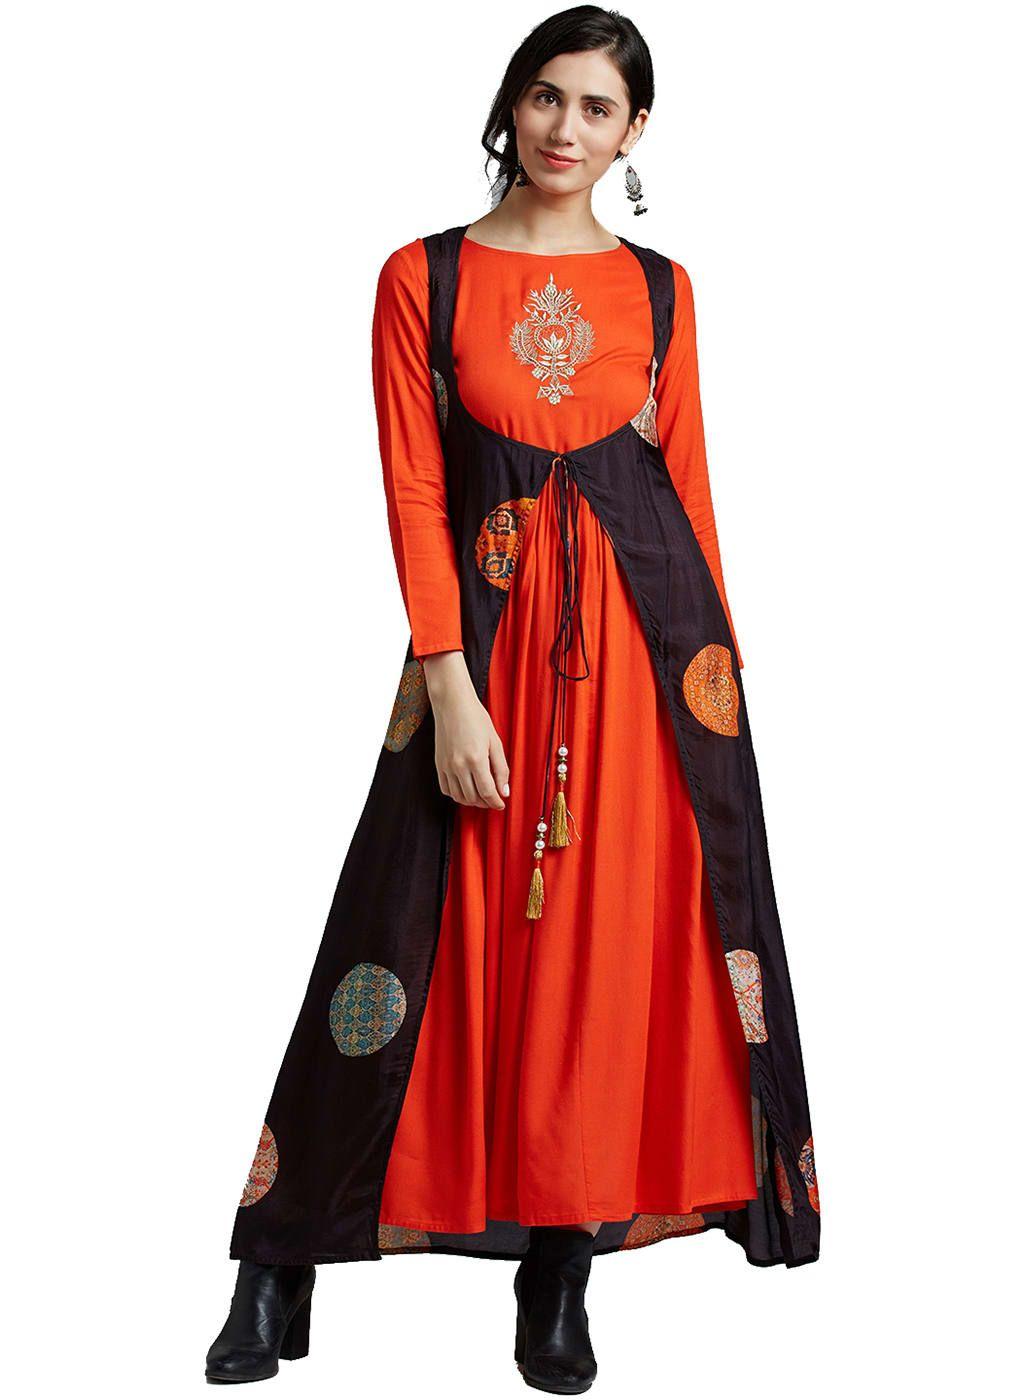 Jaipur Kurti Orange Rayon Dress With Black Silk Shrug Only On Ravishing Wooplr Com Best Dresses Online Shrug For Dresses Womens Skirt Rayon Dress [ 1400 x 1025 Pixel ]